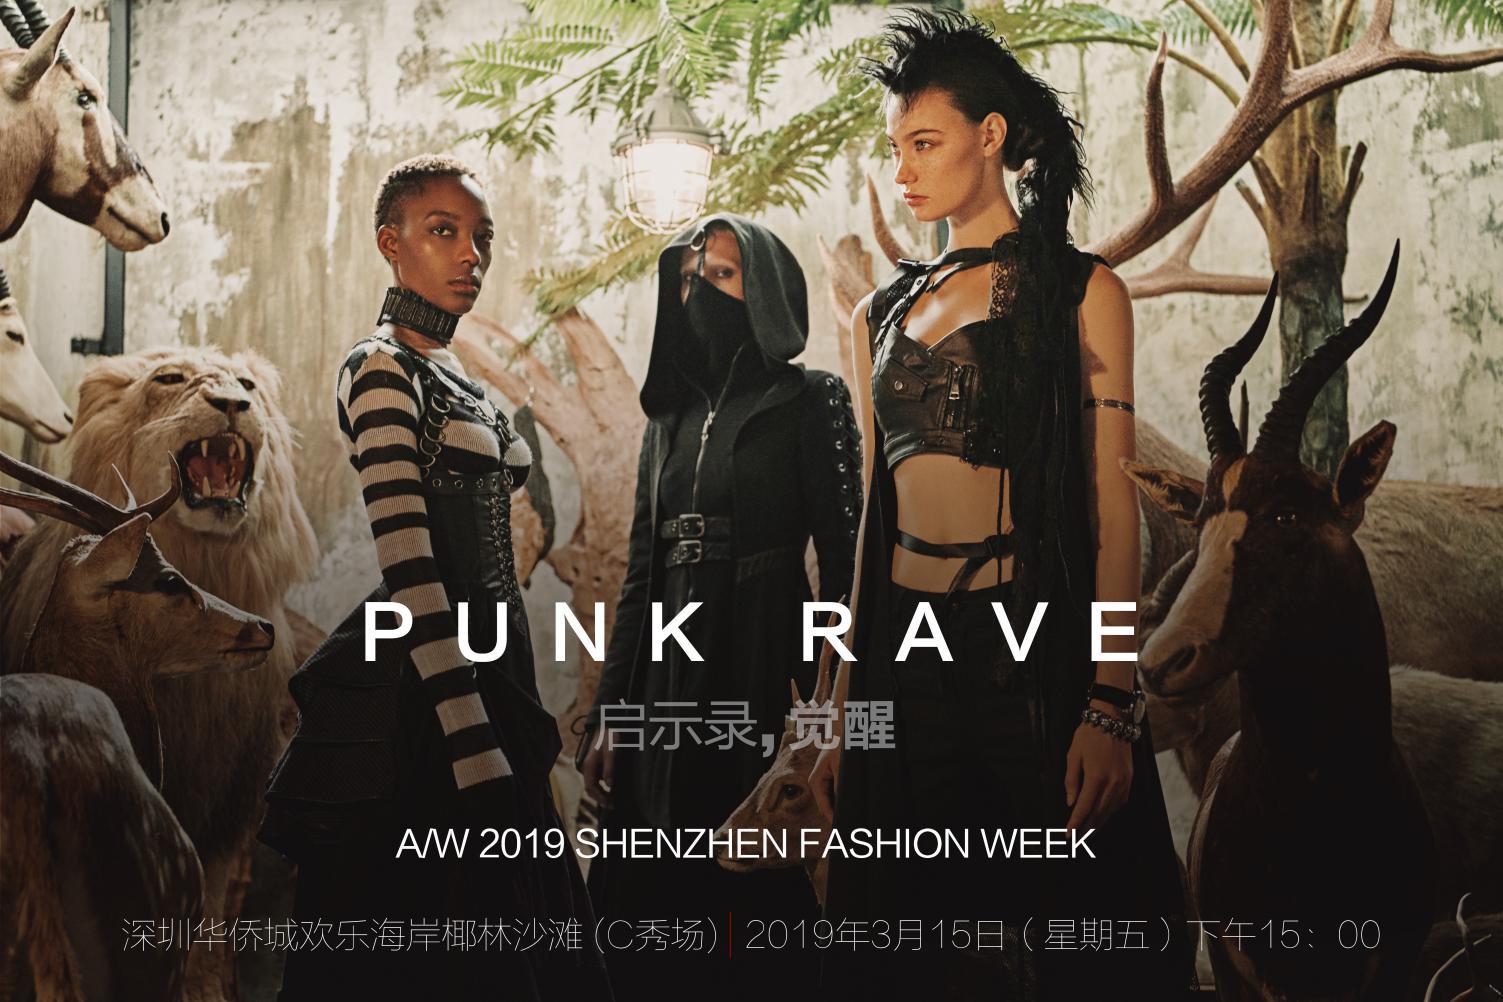 19A/W深圳时装周xPUNK RAVE《启示录 觉醒》